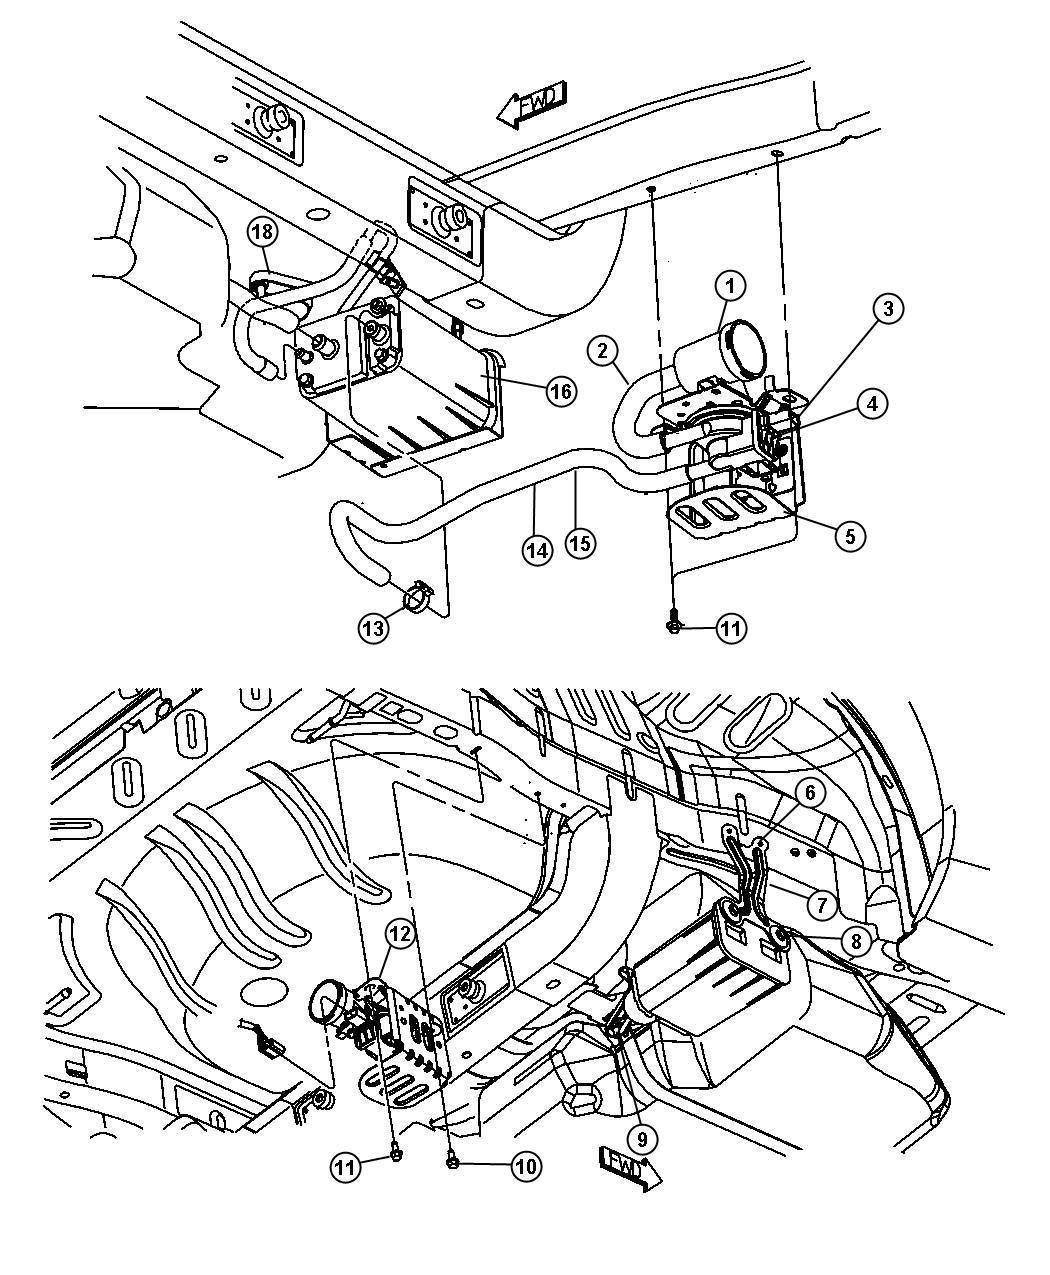 Dodge Neon SRT4, 2.4L I4 DOHC 16V H.O. Turbo, 5-Speed